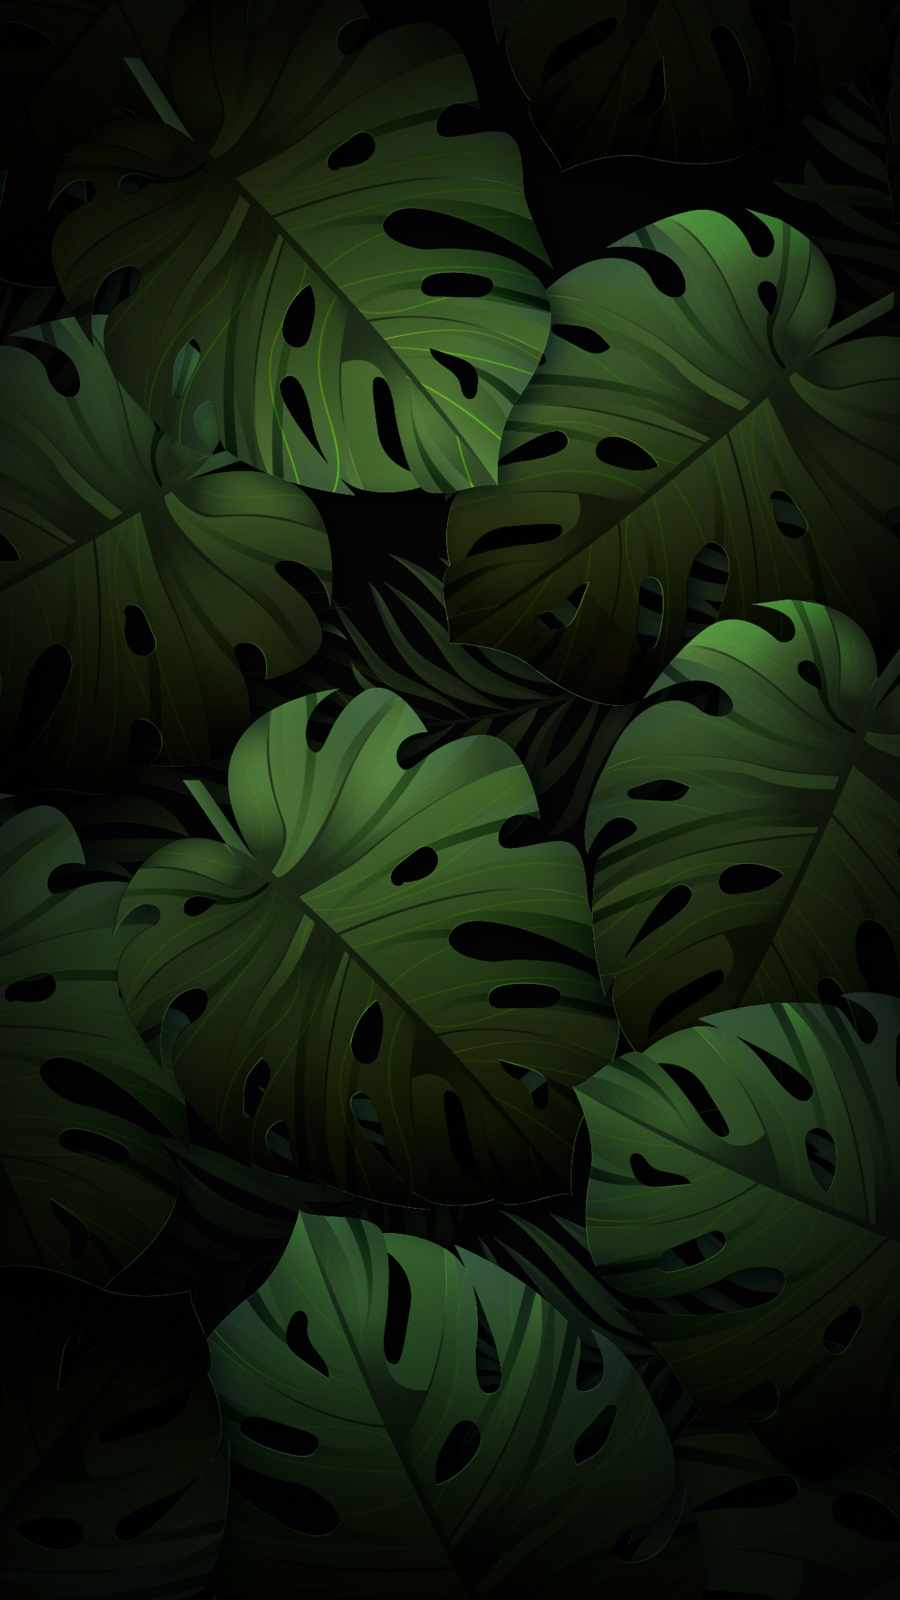 Green Foliage Nature